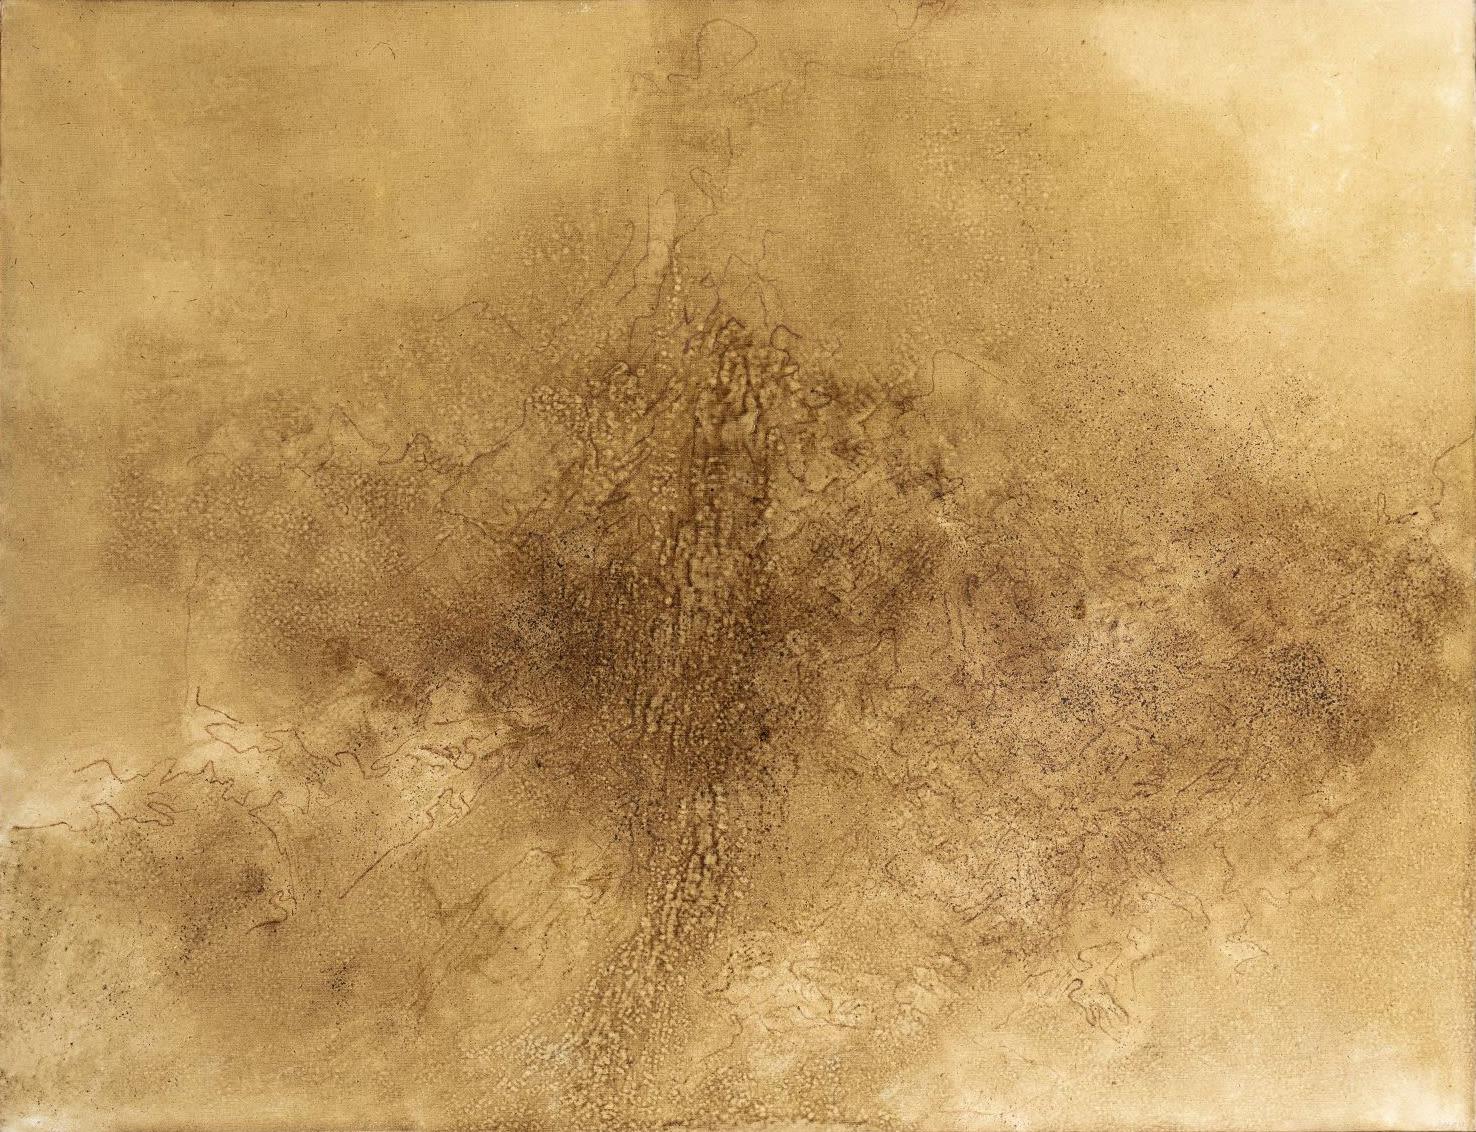 Lalan 謝景蘭, La terre blessée | The Spoiled Land 《赤土千里》, 1990